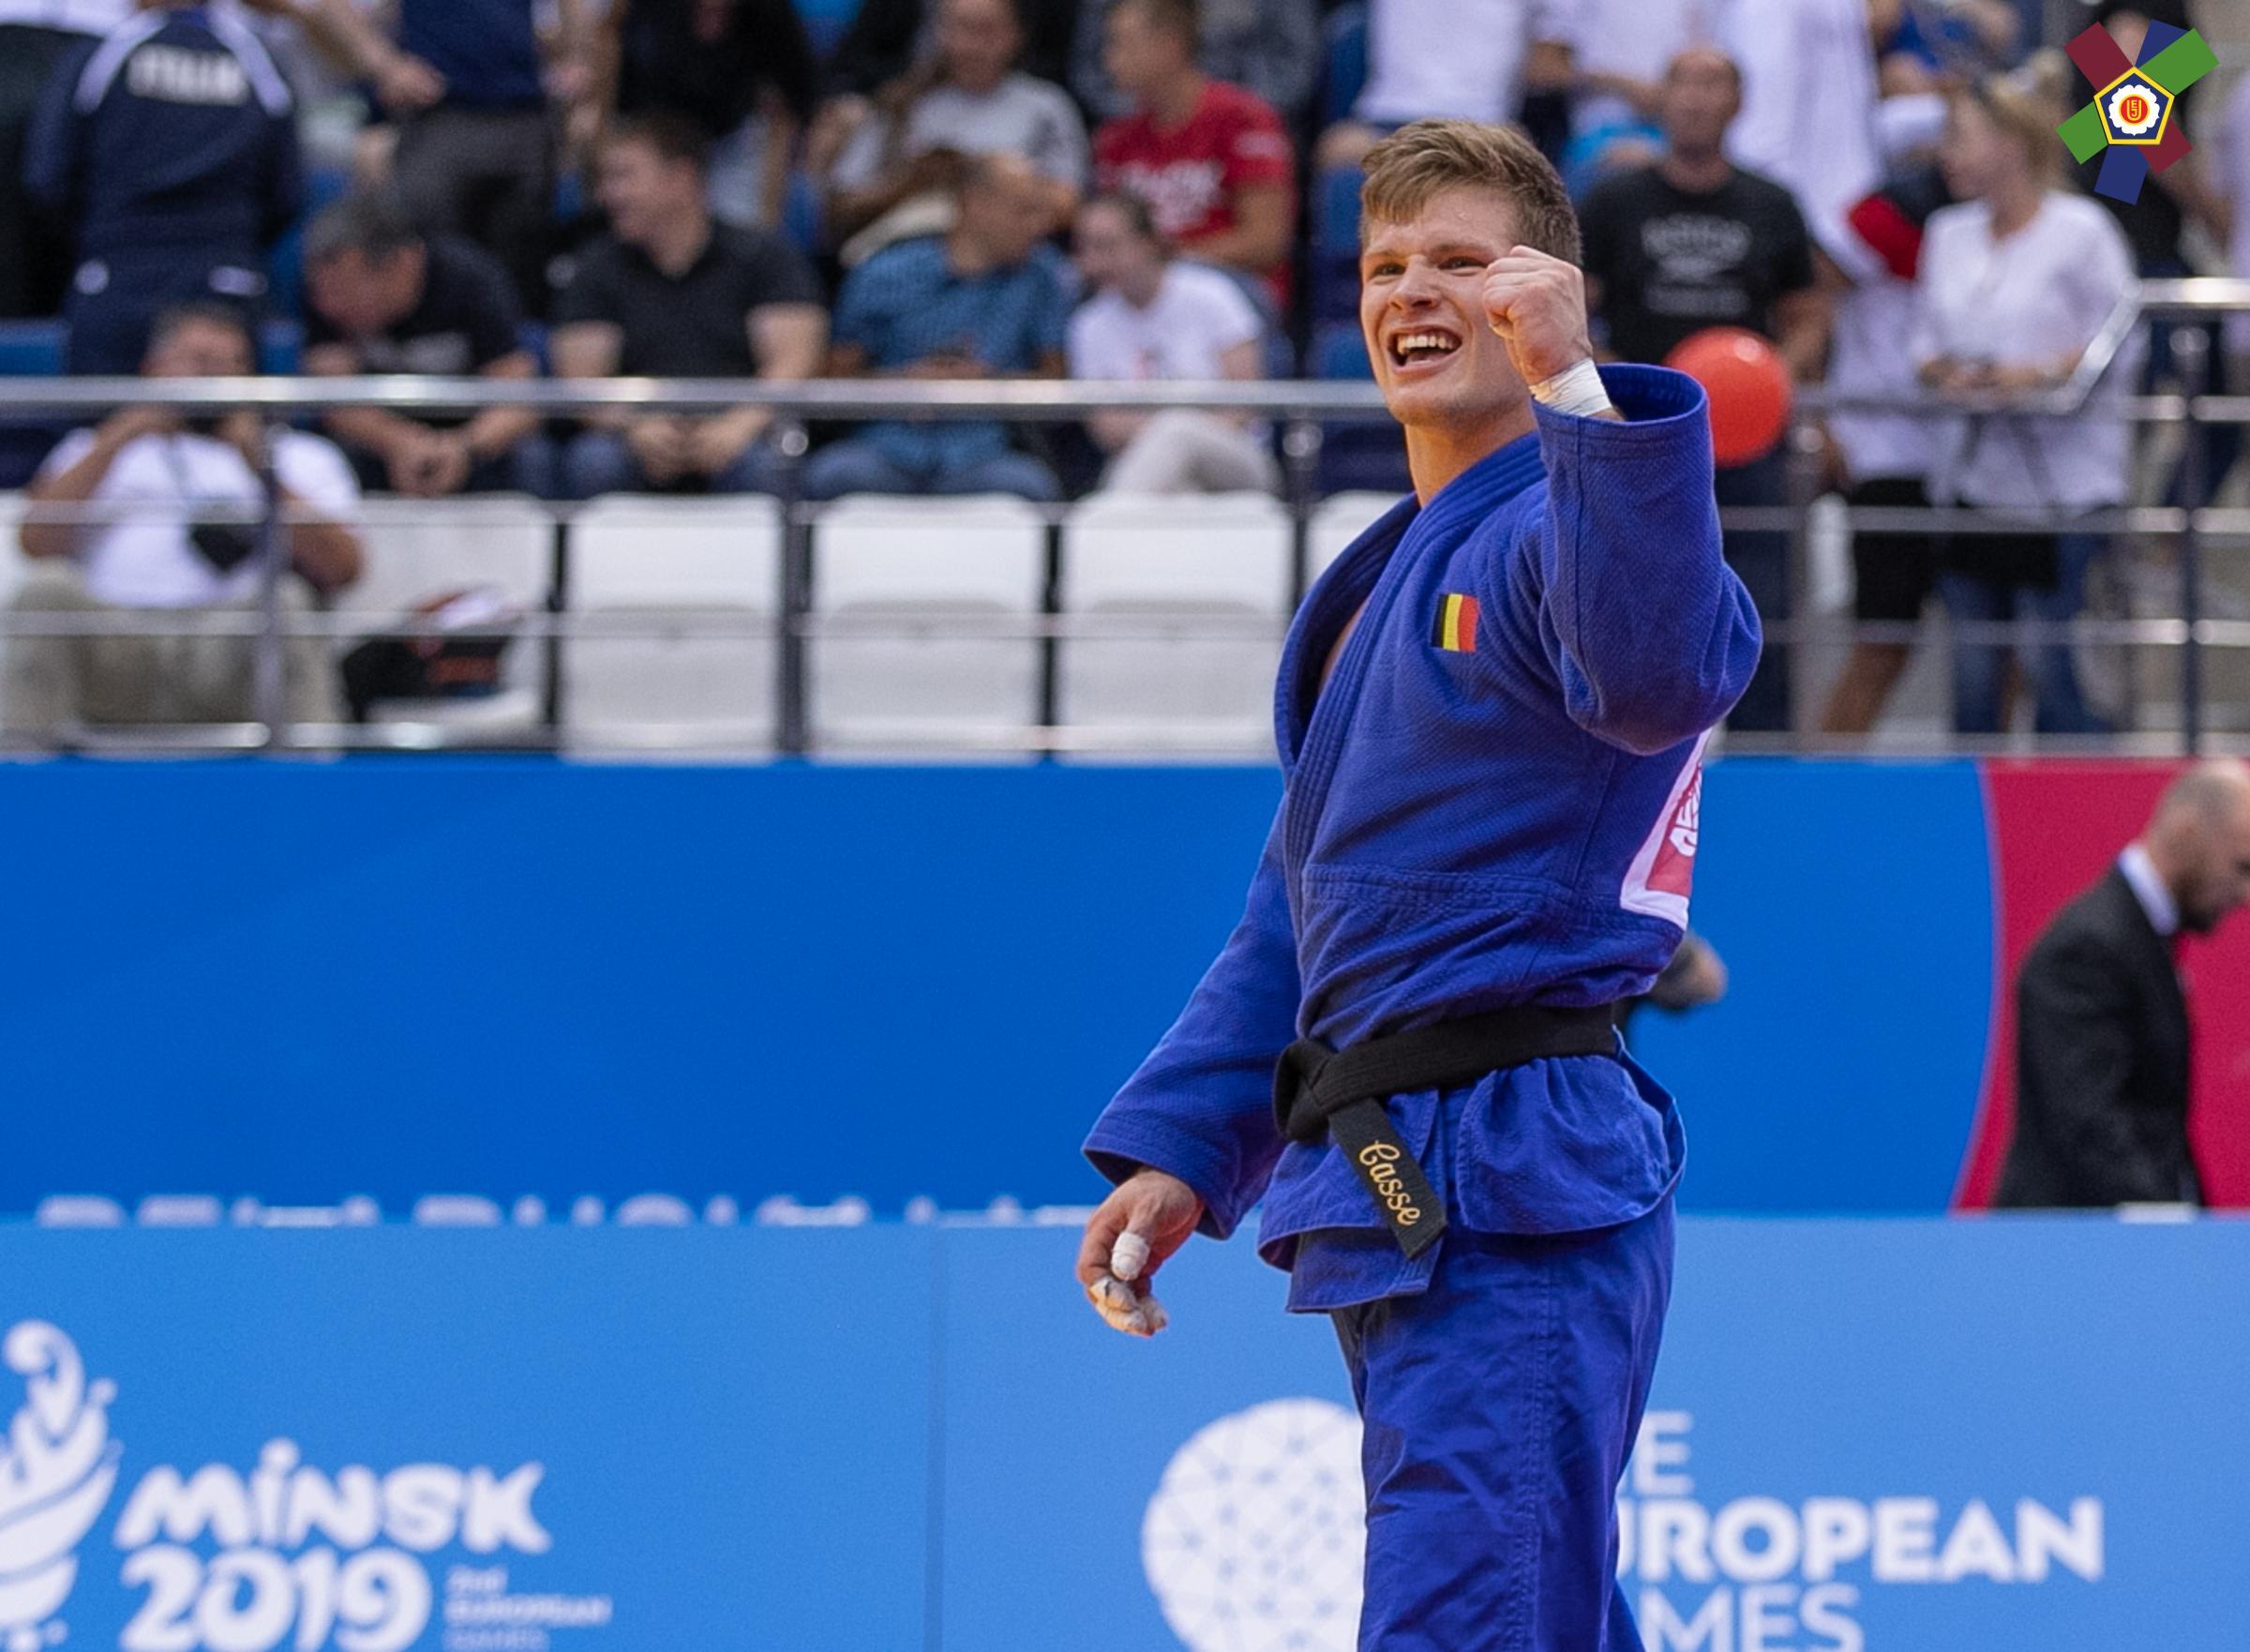 EJU-Senior-European-Games-European-Championships-2019-Casse-1